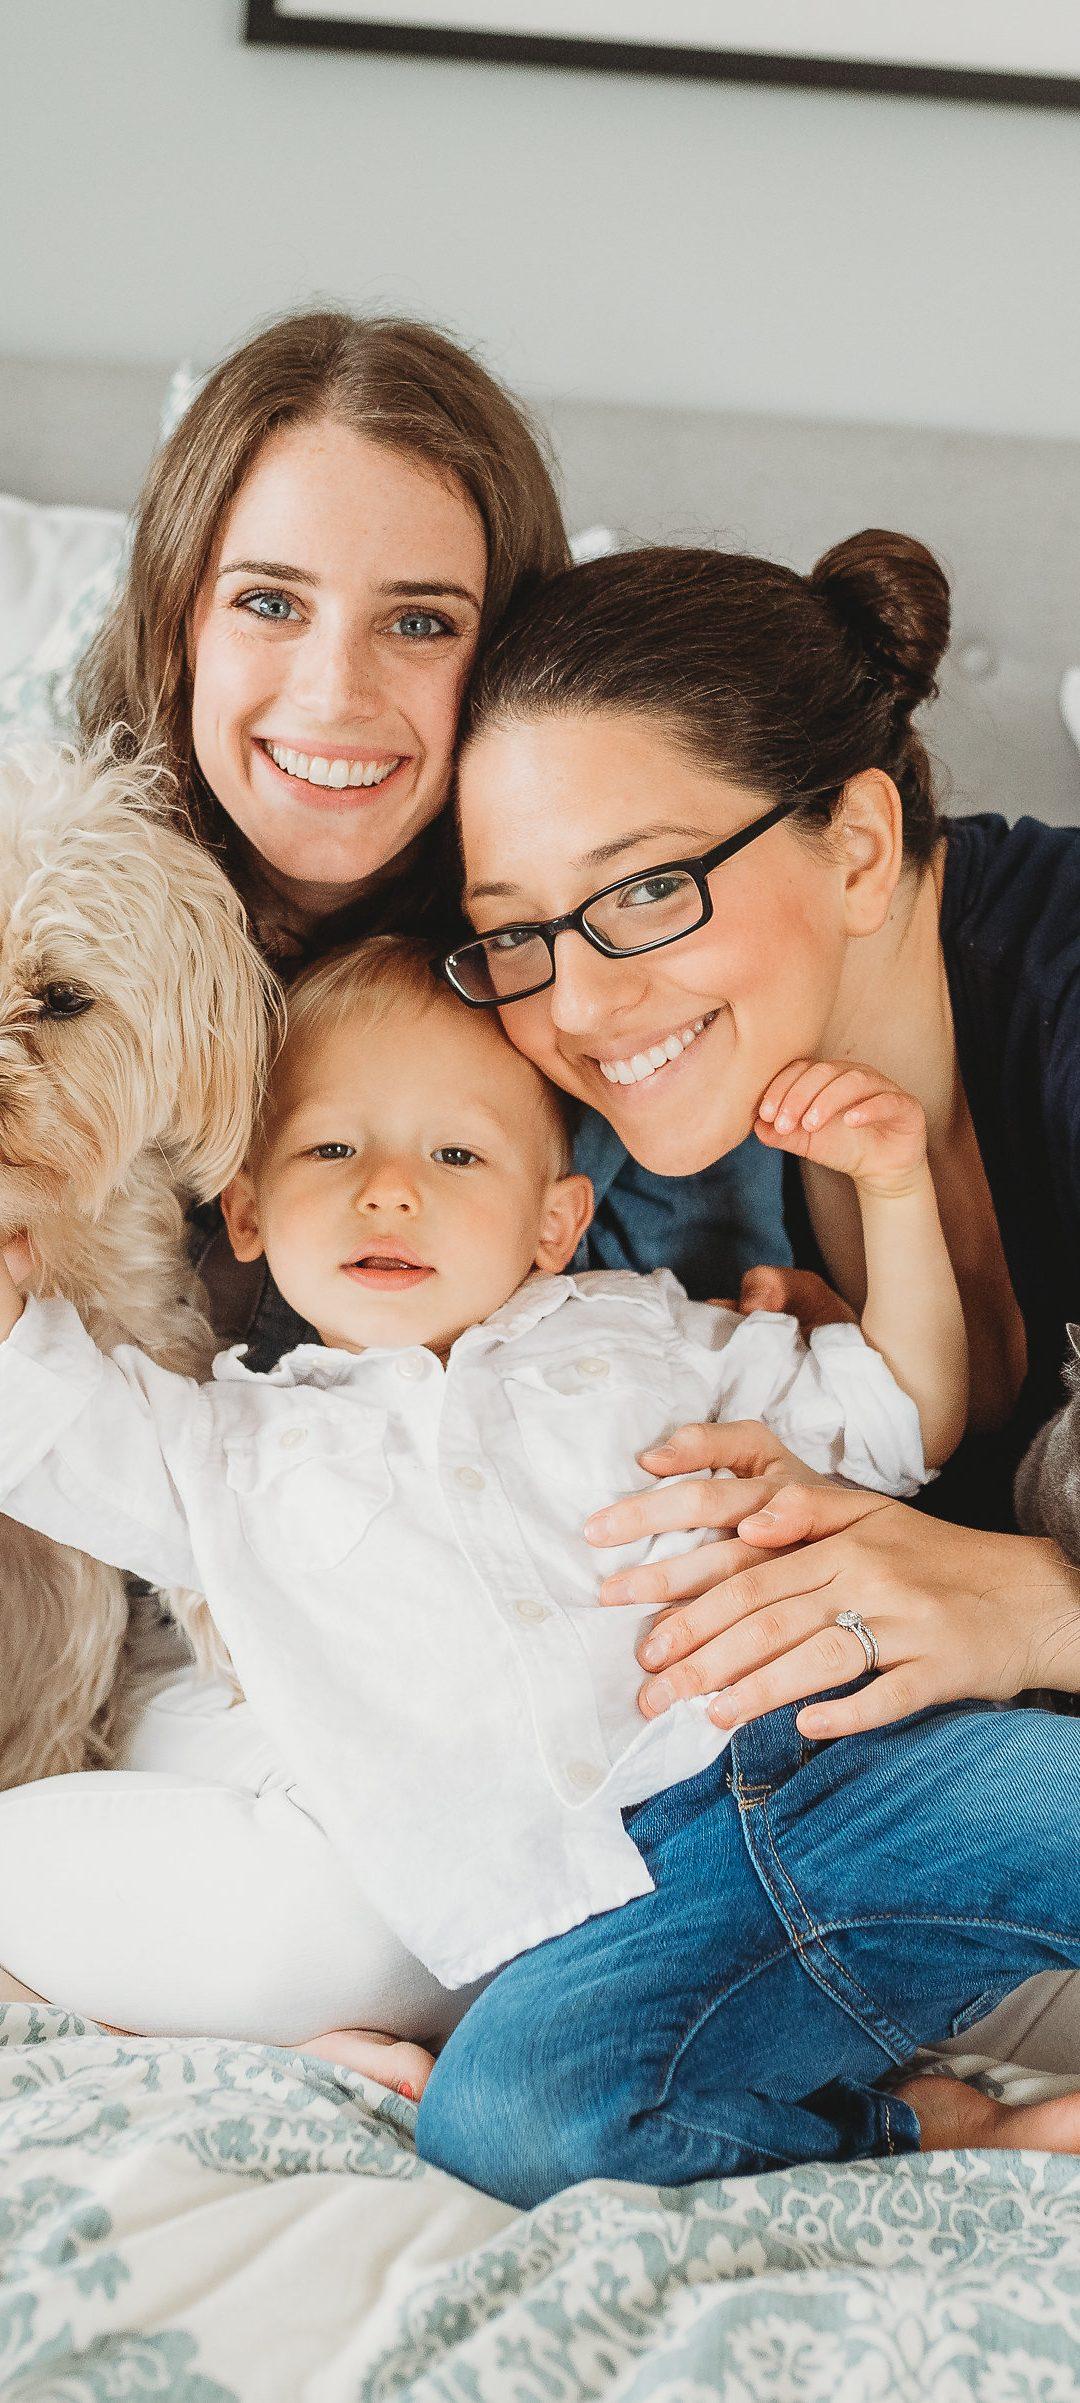 loss of a family pet.